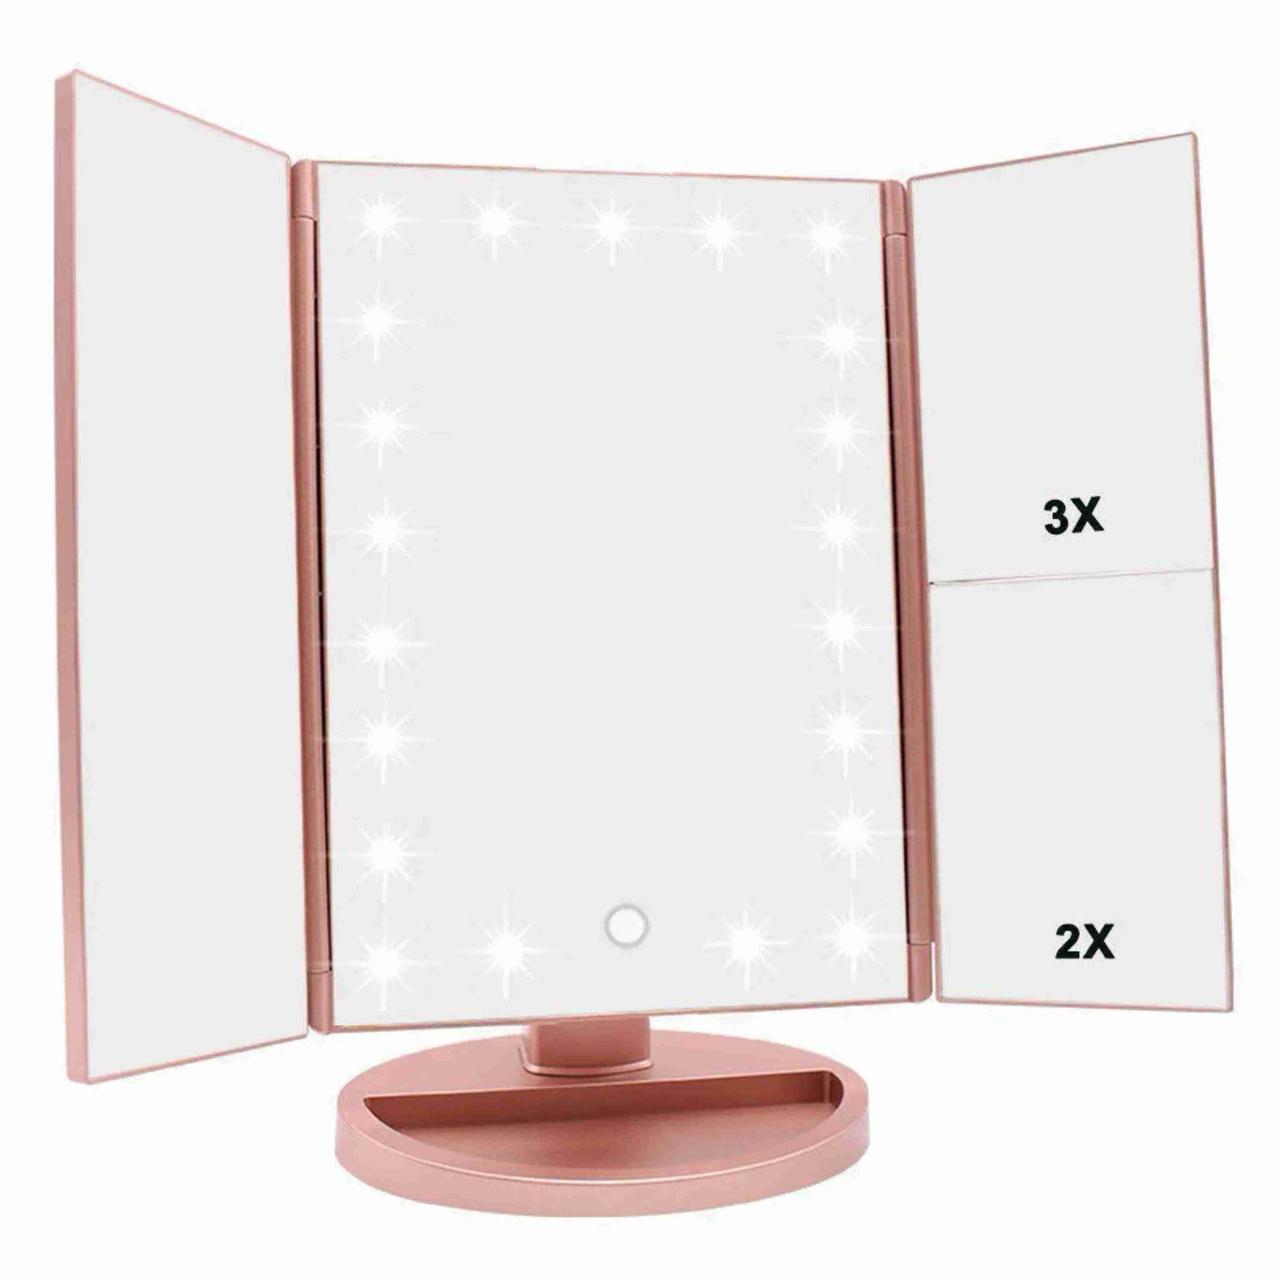 Тройное зеркало со станями Led miror Розовое / Тройное зеркало Led miror / зеркало Led miror Magnifying Mirror